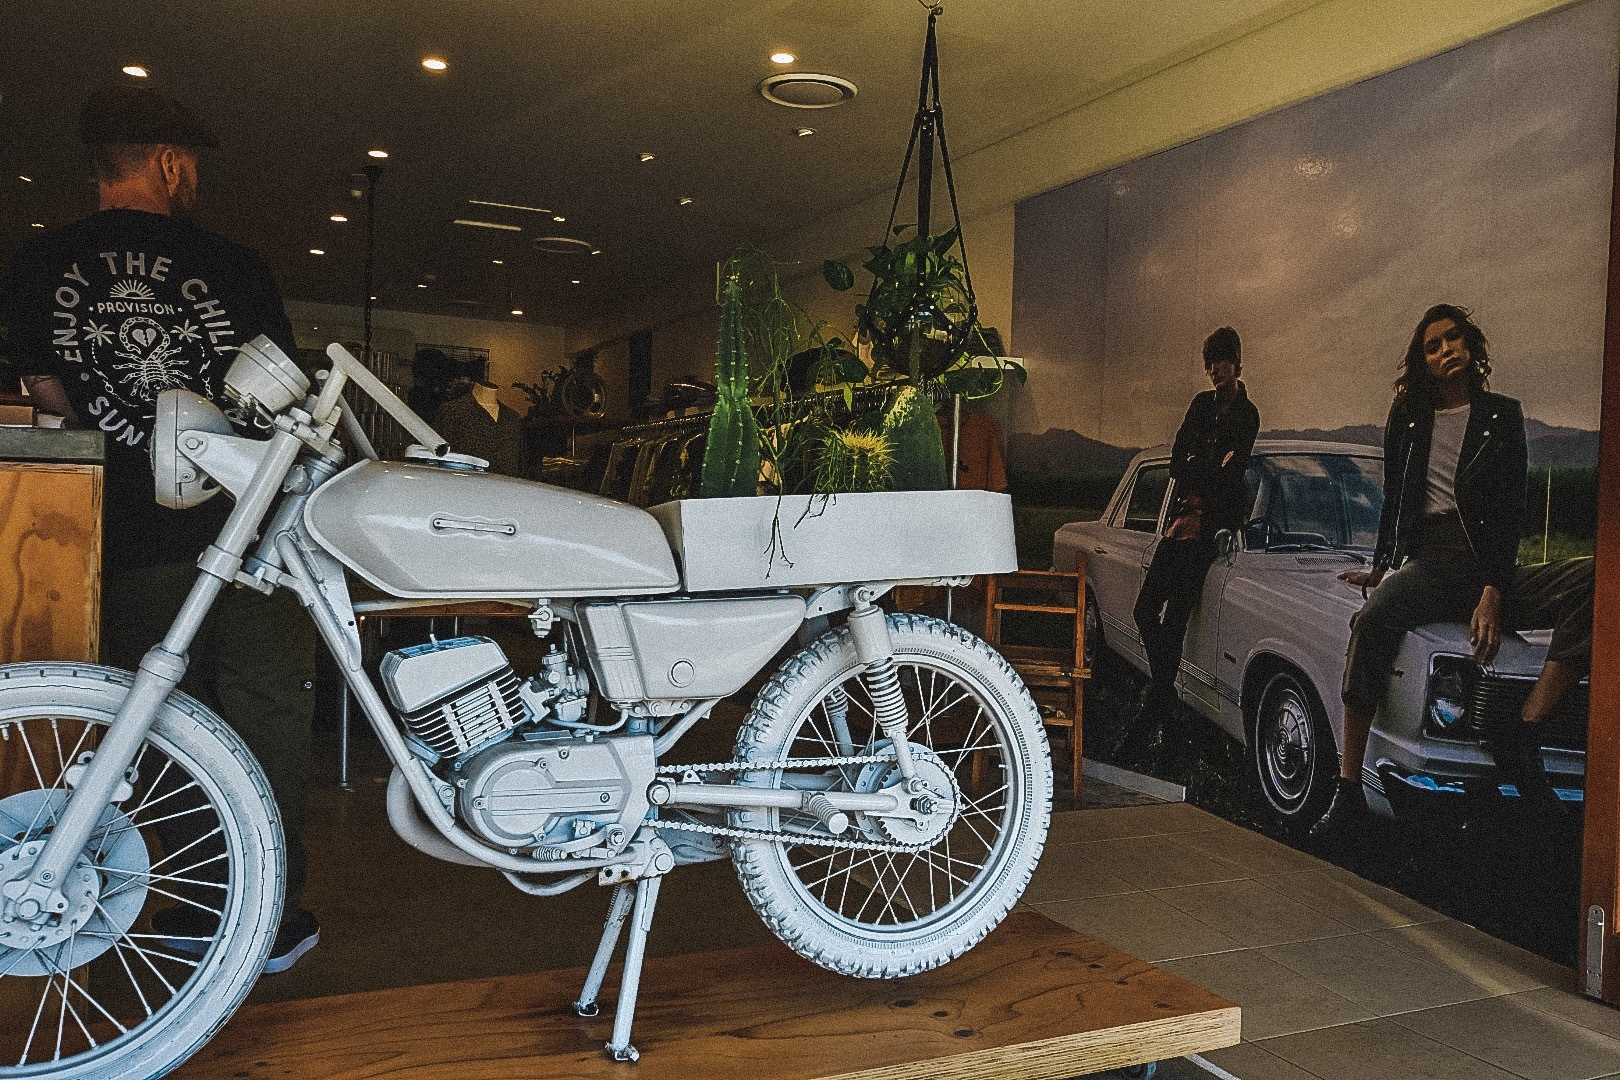 motorcycle-display-in-clothing-store-in-byron-bay